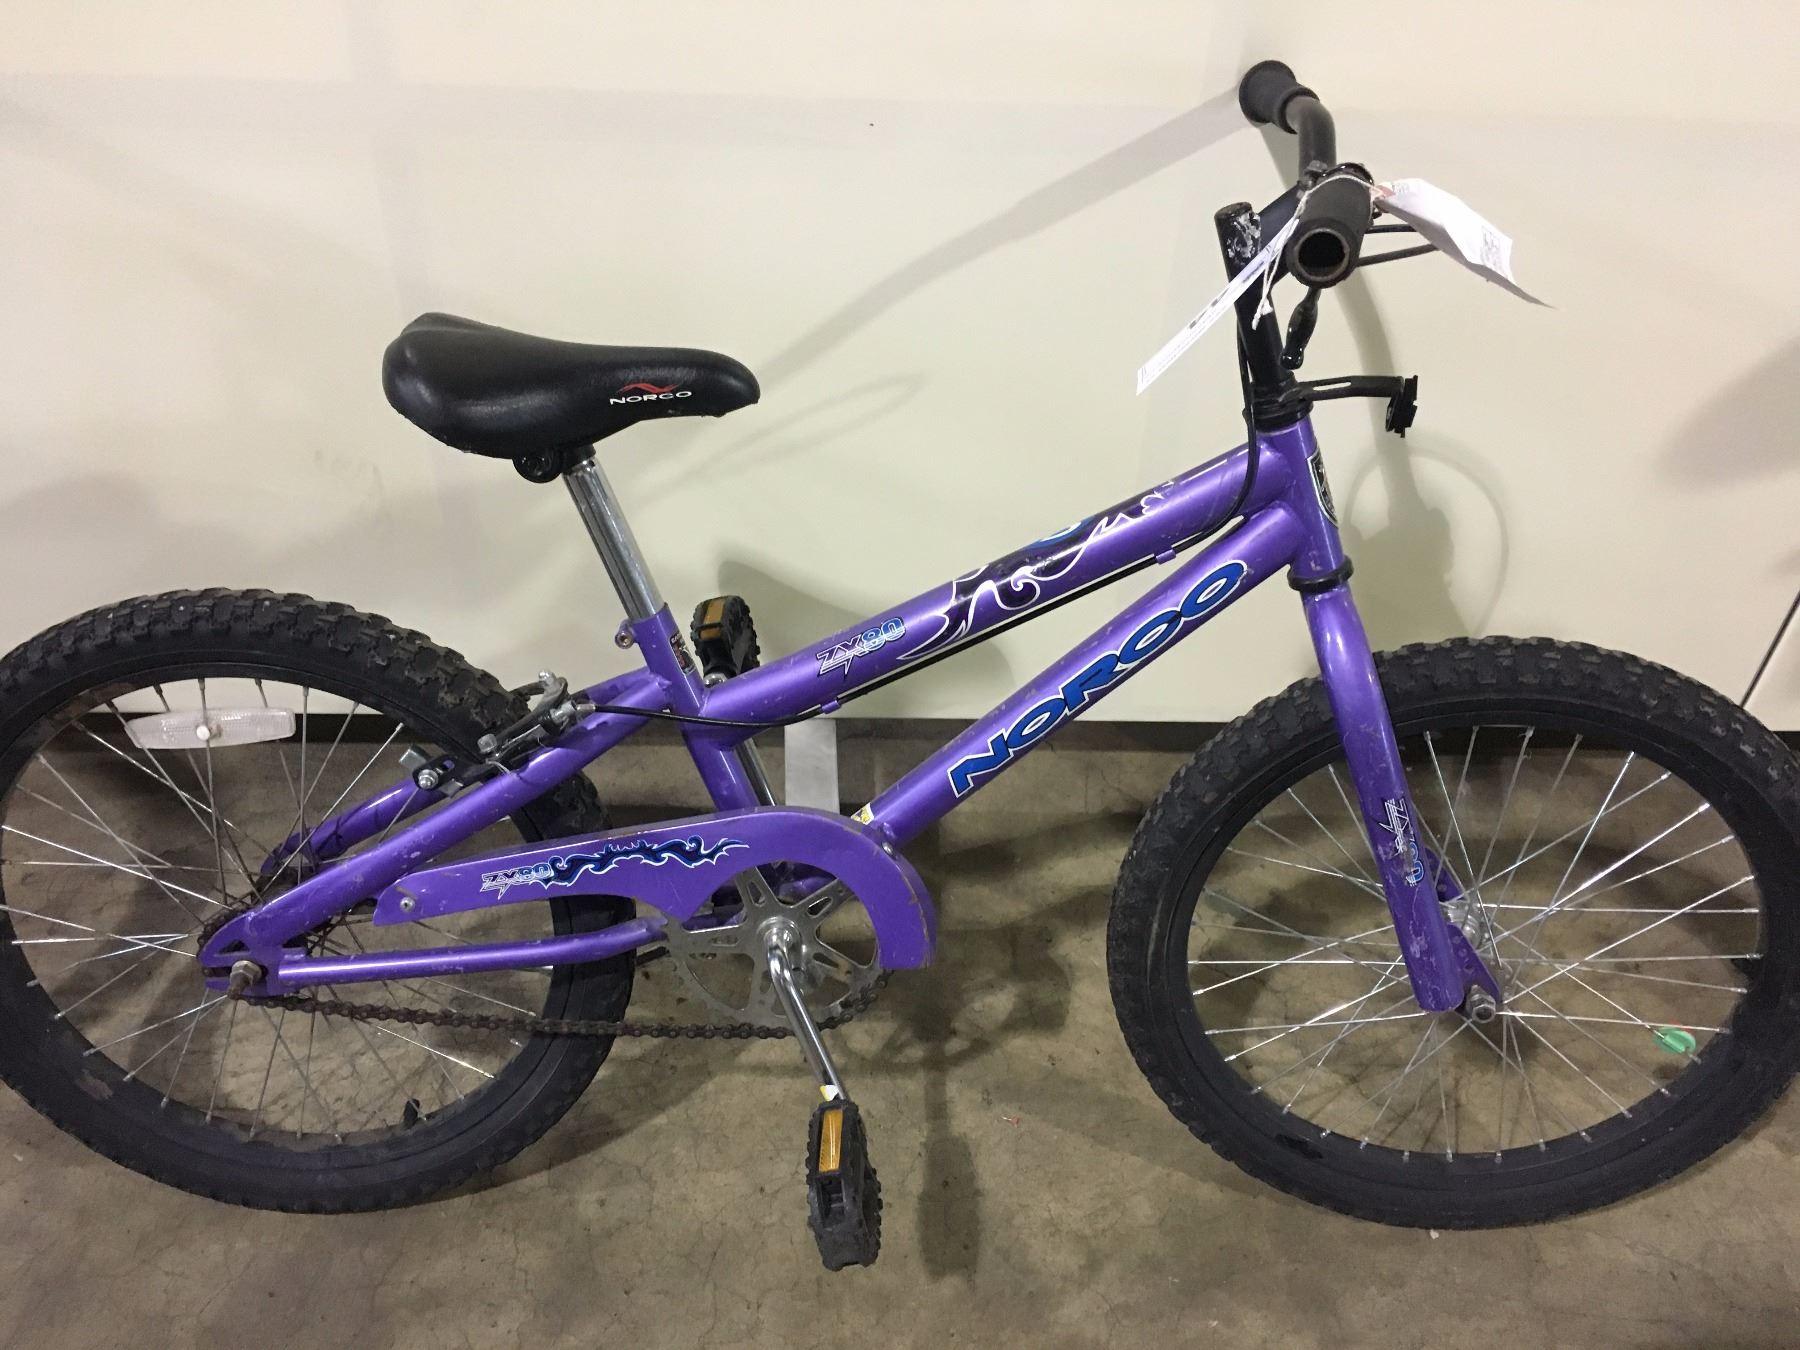 2 Bikes Purple Norco Kids Bike Blue Sportek Mountain Bike Pagina ufficiale dei prodotti & marchio sportek. 2 bikes purple norco kids bike blue